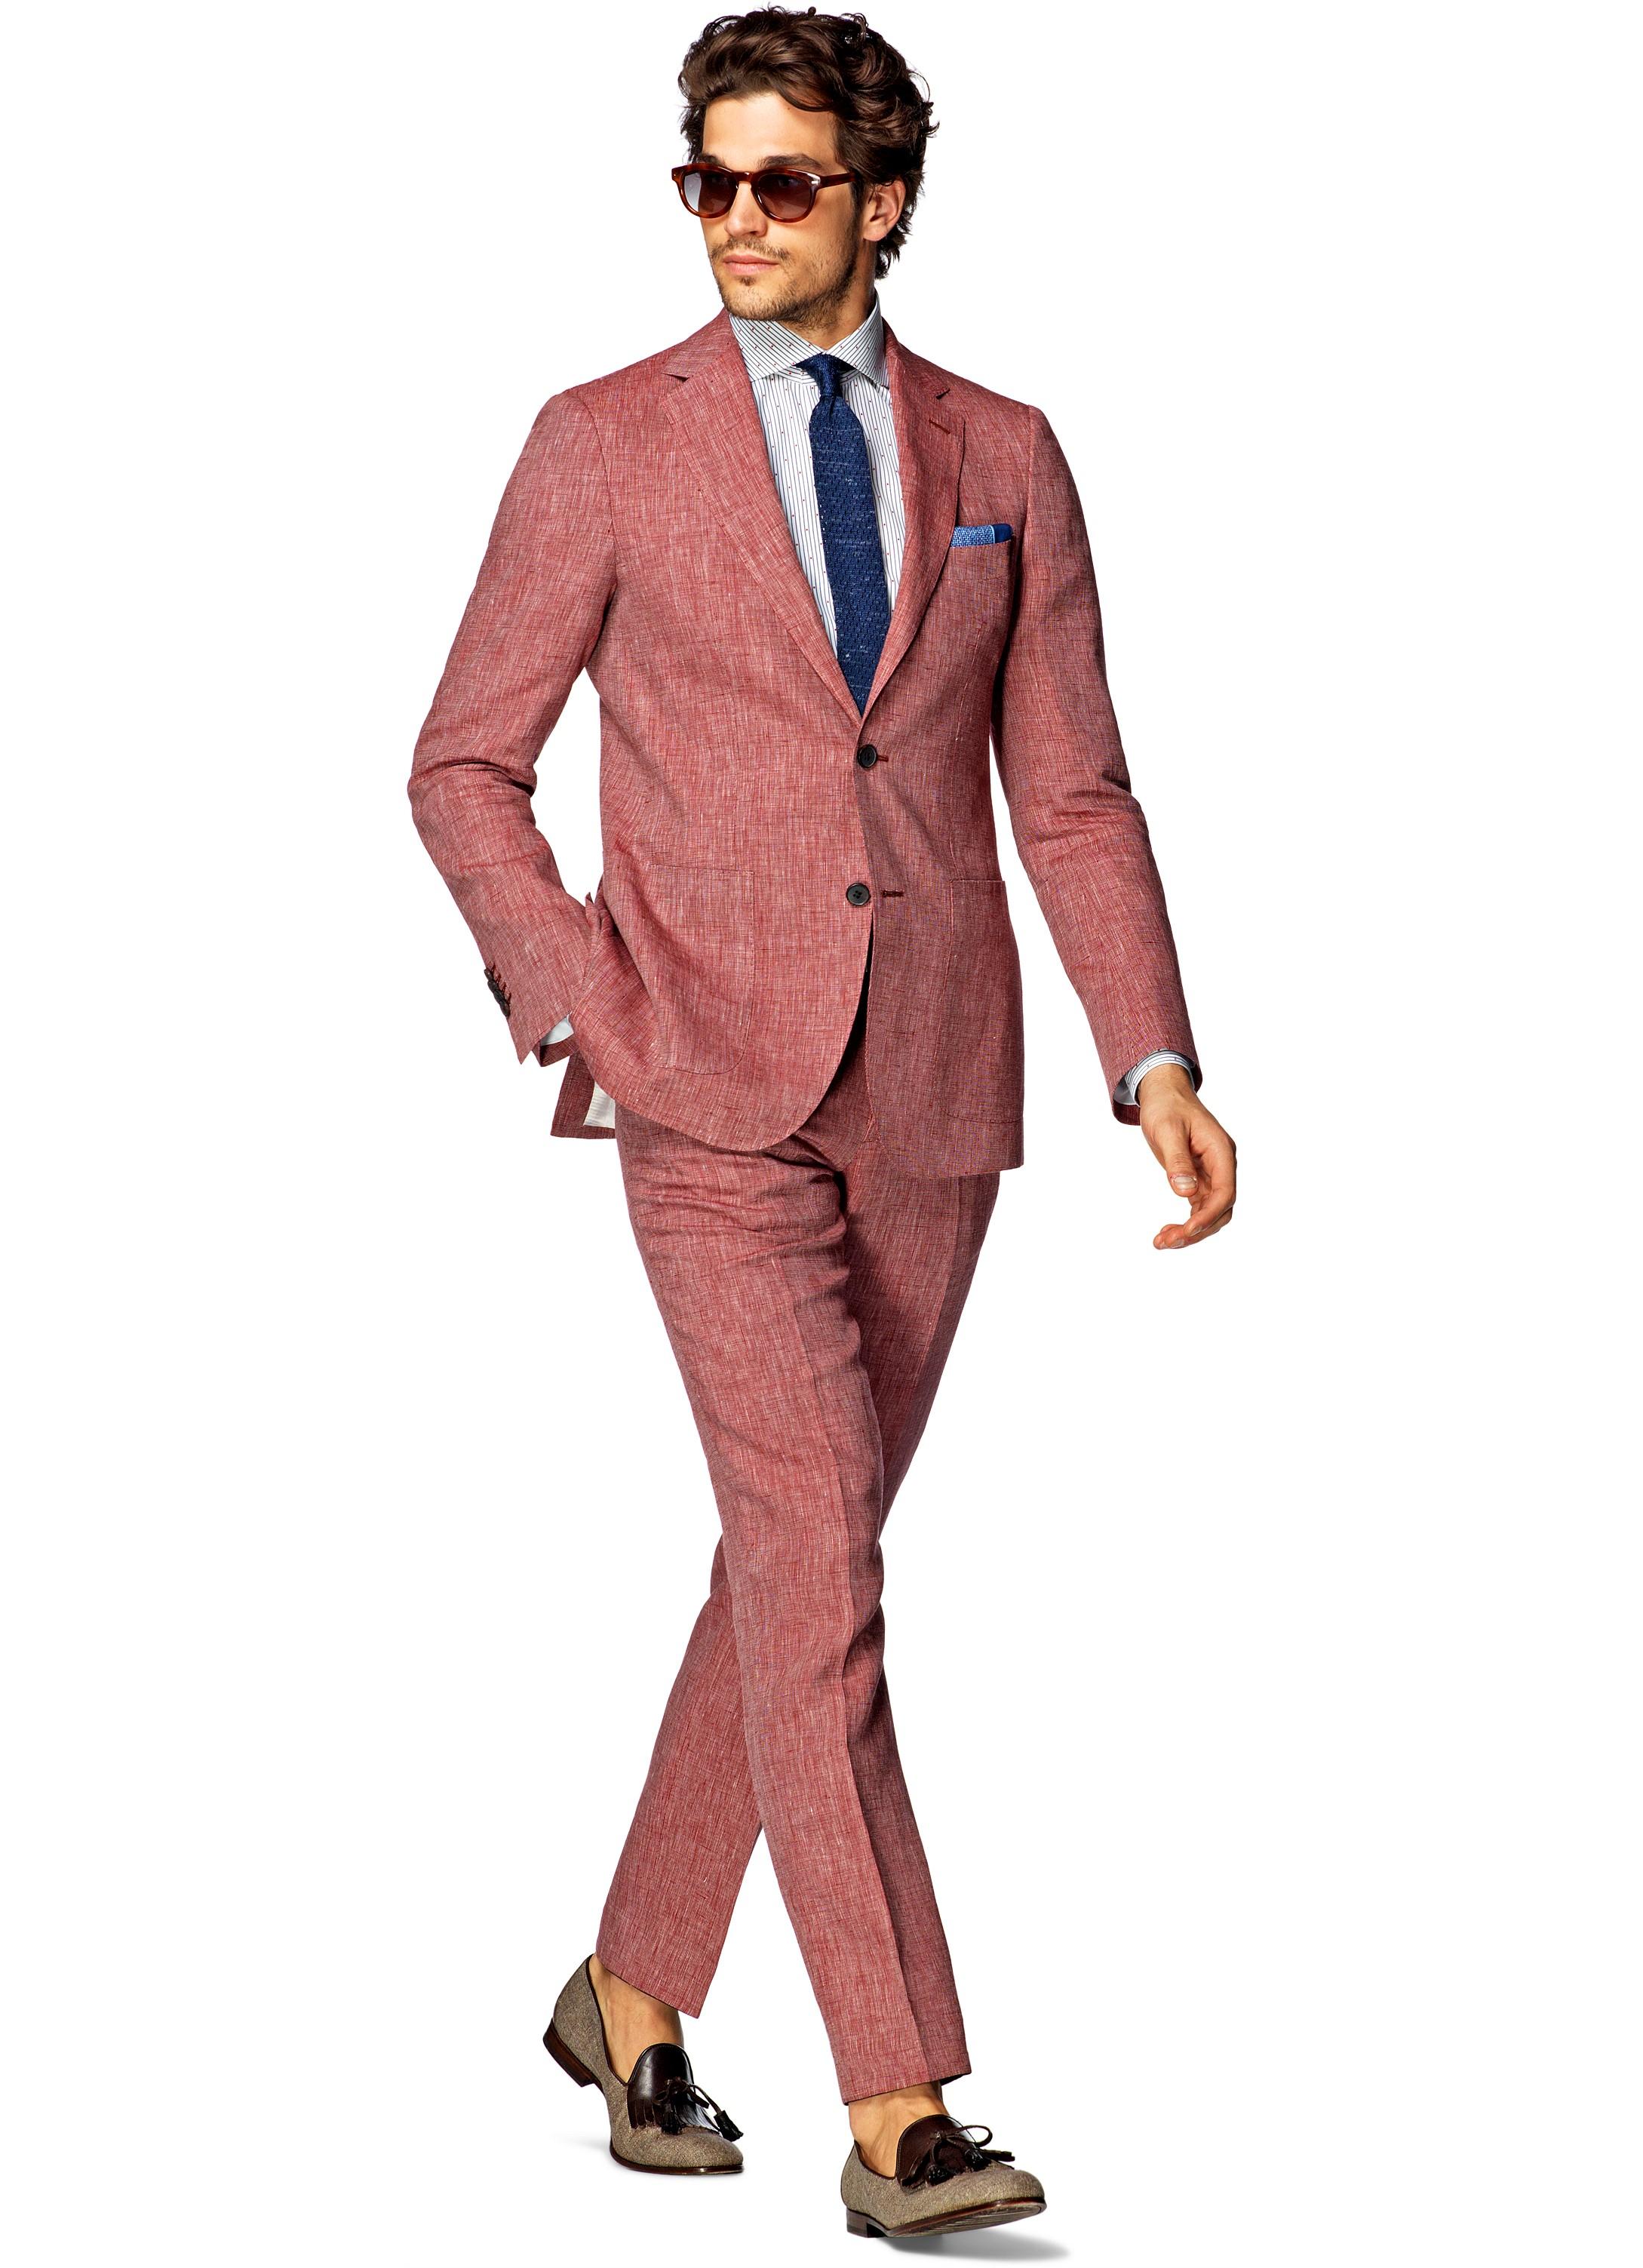 Suits_Red_Plain_Havana_P4238_Suitsupply_Online_Store_1.jpg